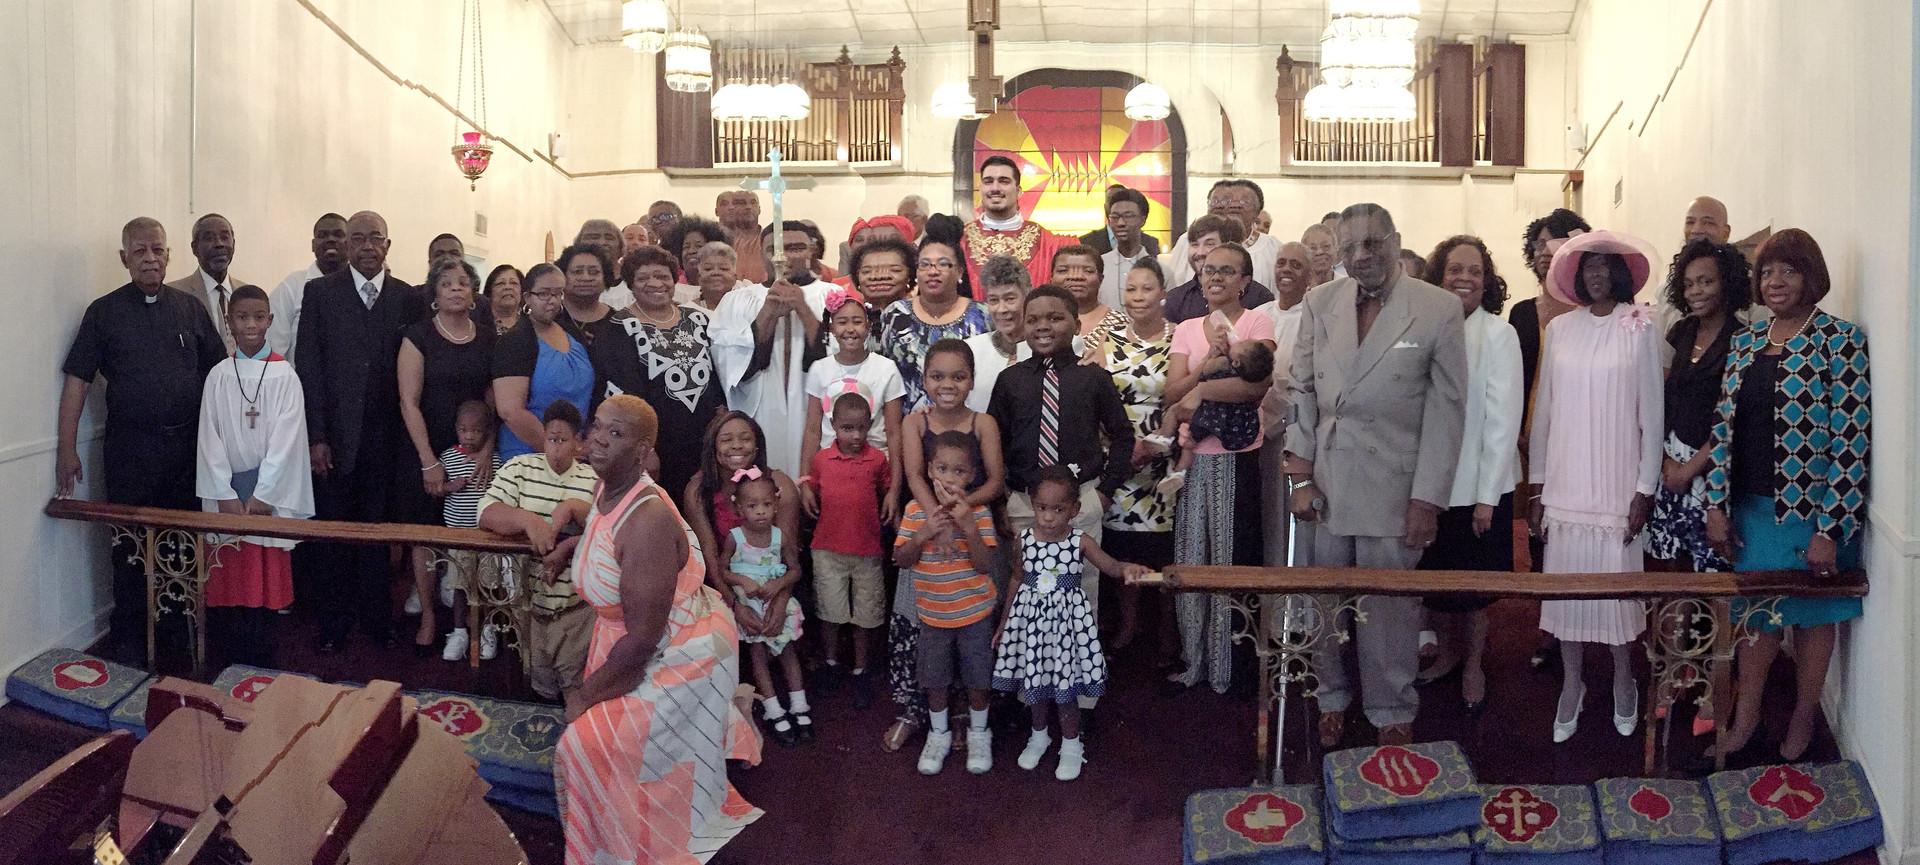 St. Matthew's Day 2016